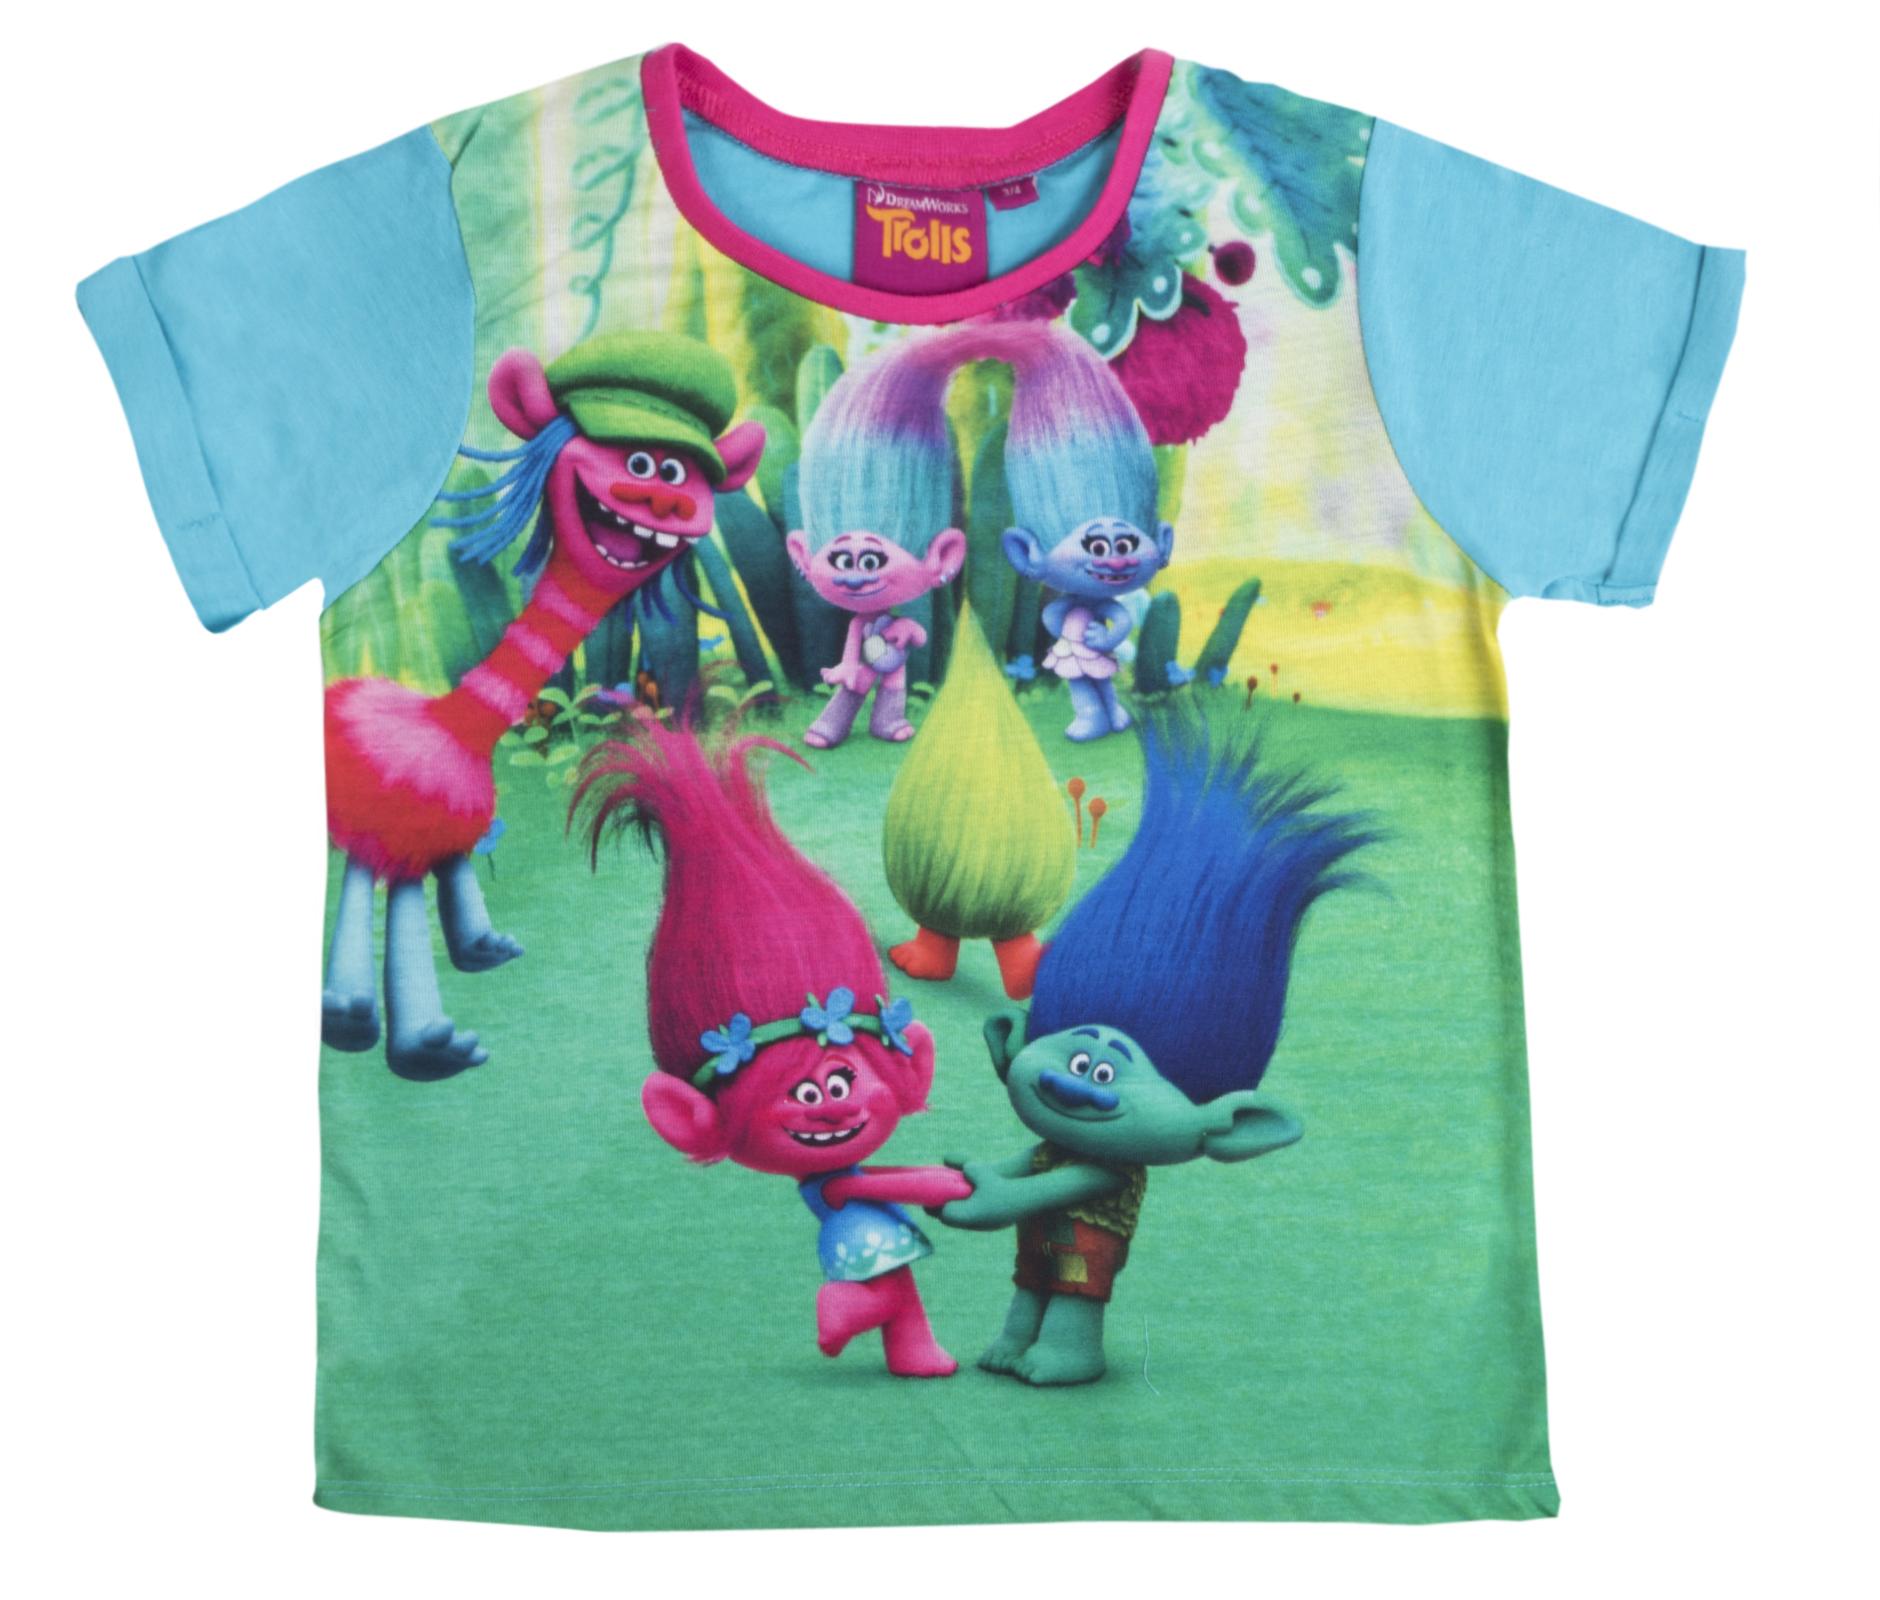 Shorts Pjs Set Kids Size Trolls Pyjamas Shortie Princess Poppy Branch T Shirt